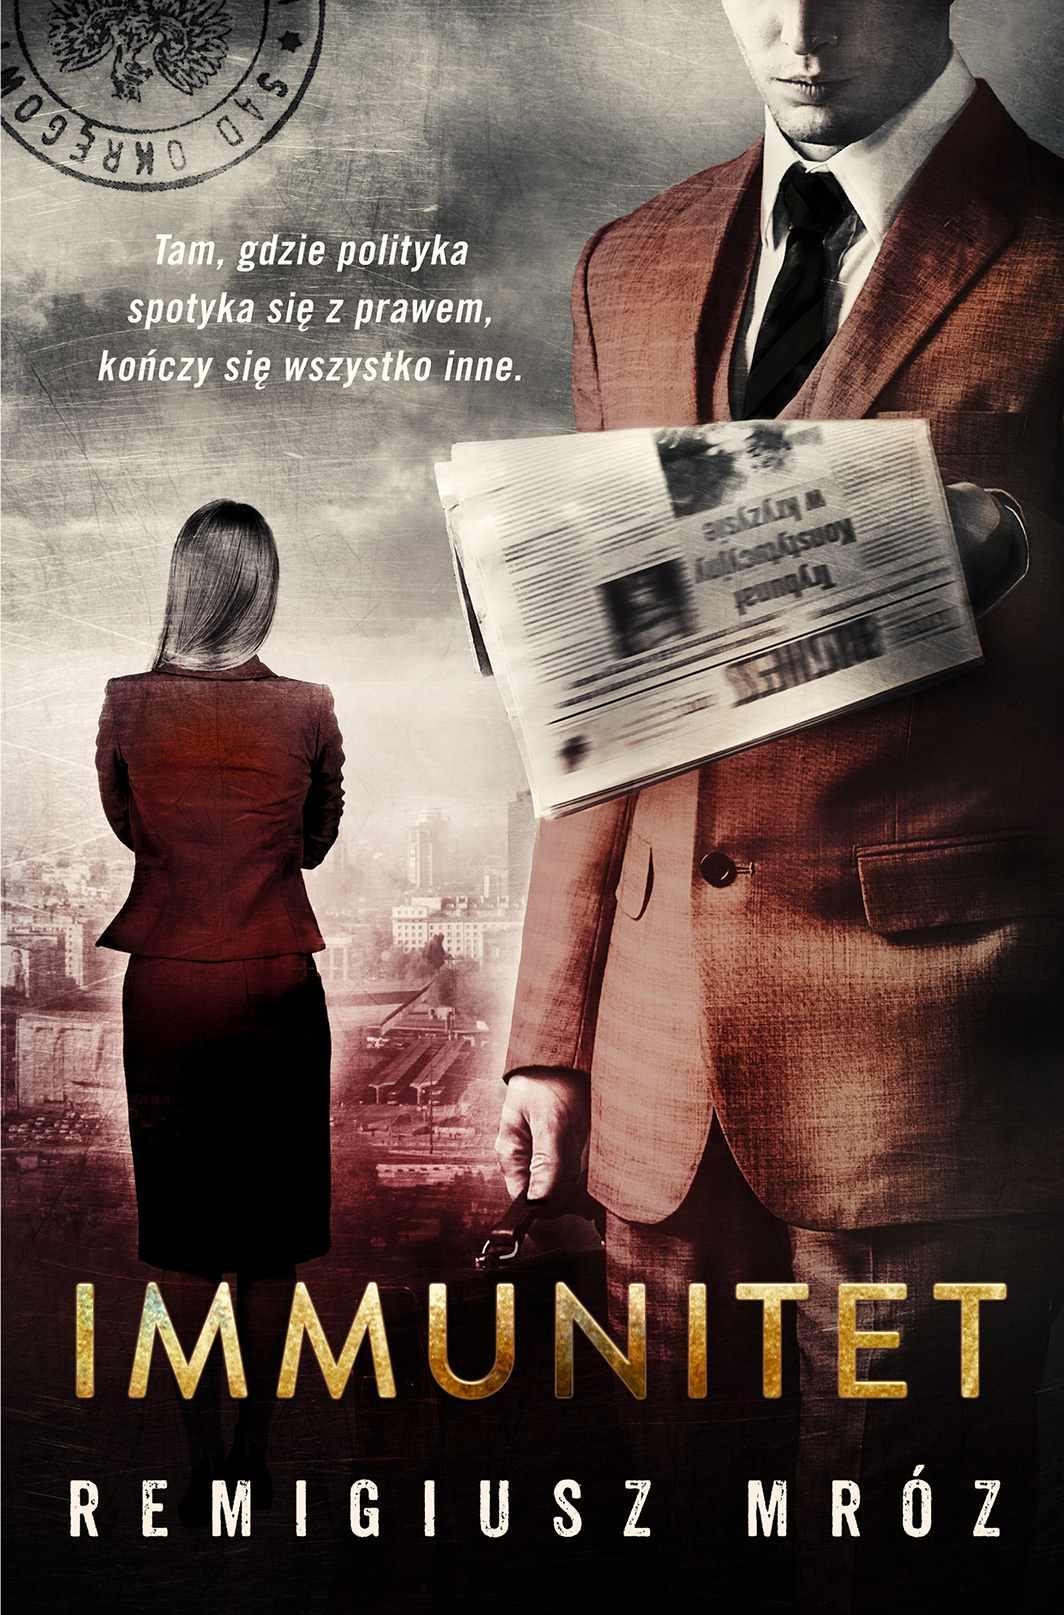 Immunitet - Ebook (Książka na Kindle) do pobrania w formacie MOBI